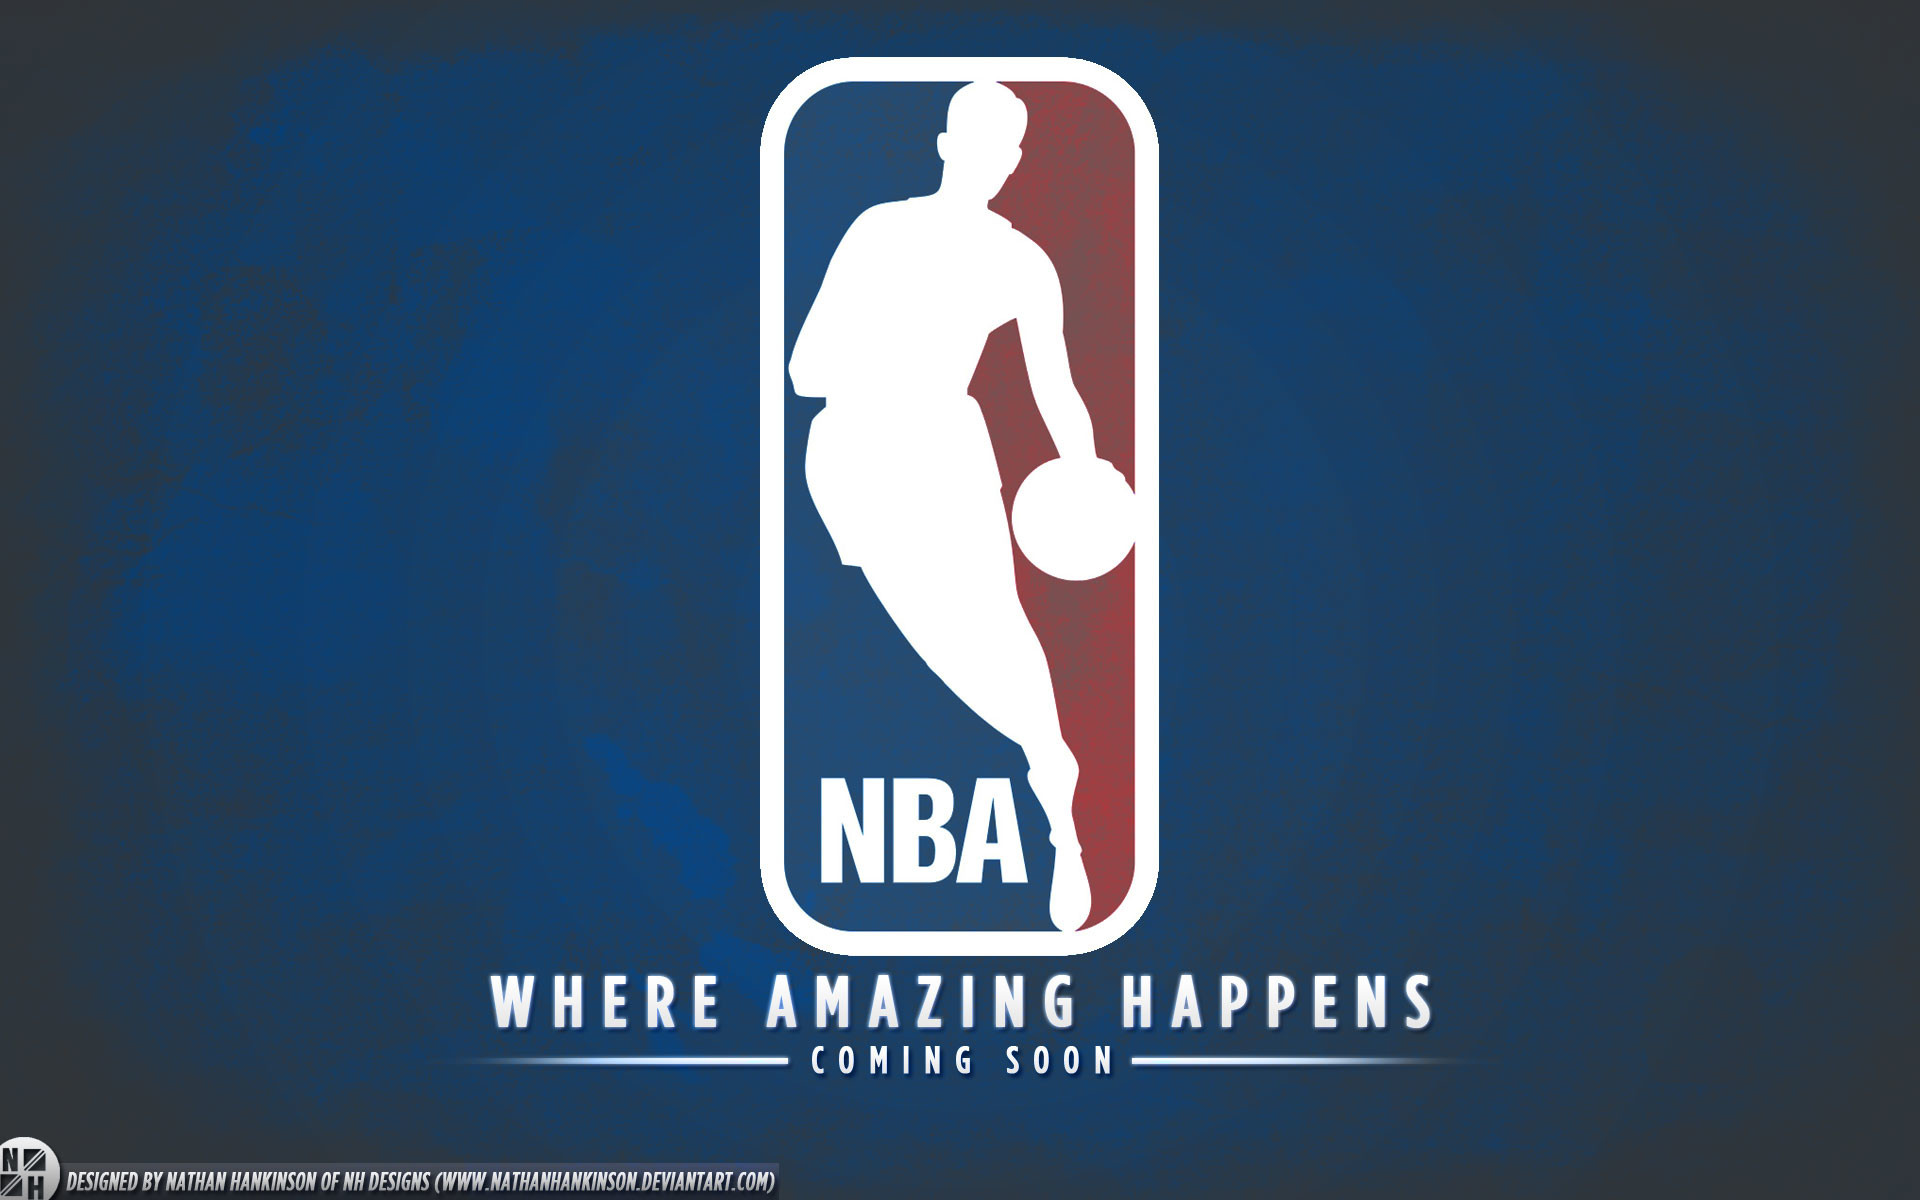 NBA 2013 Coming Soon Wallpaper